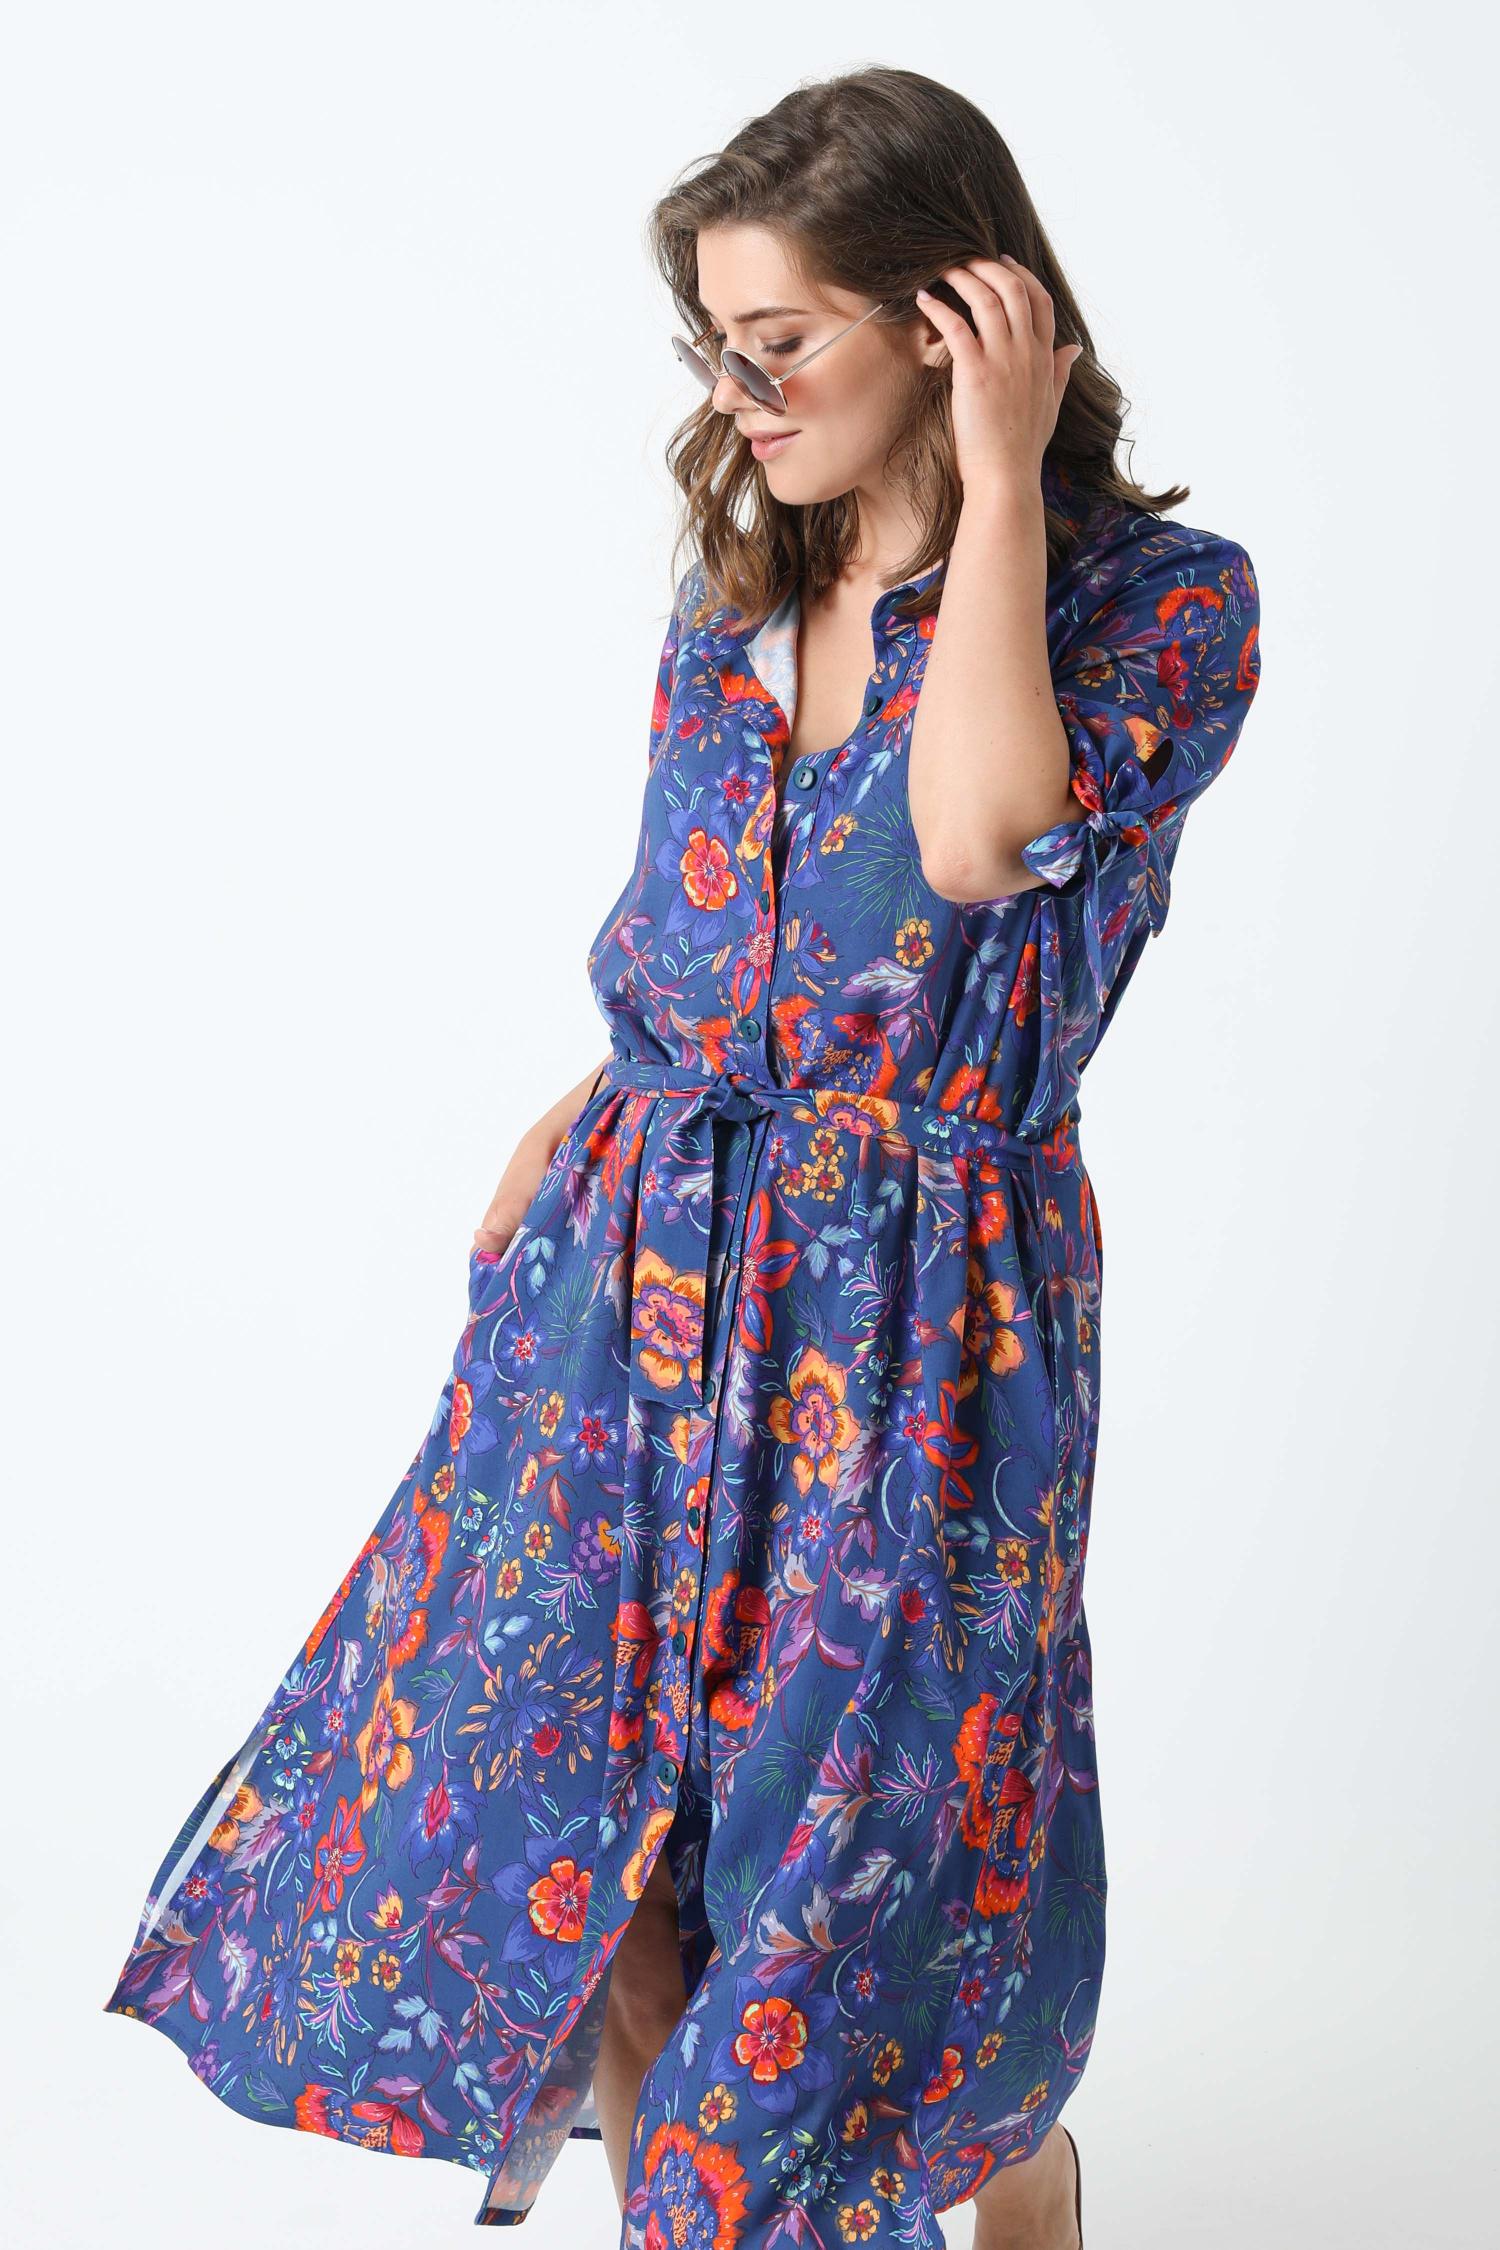 Long printed shirt dress oeko-tex fabrics (Shipping 10/15 JUNE)